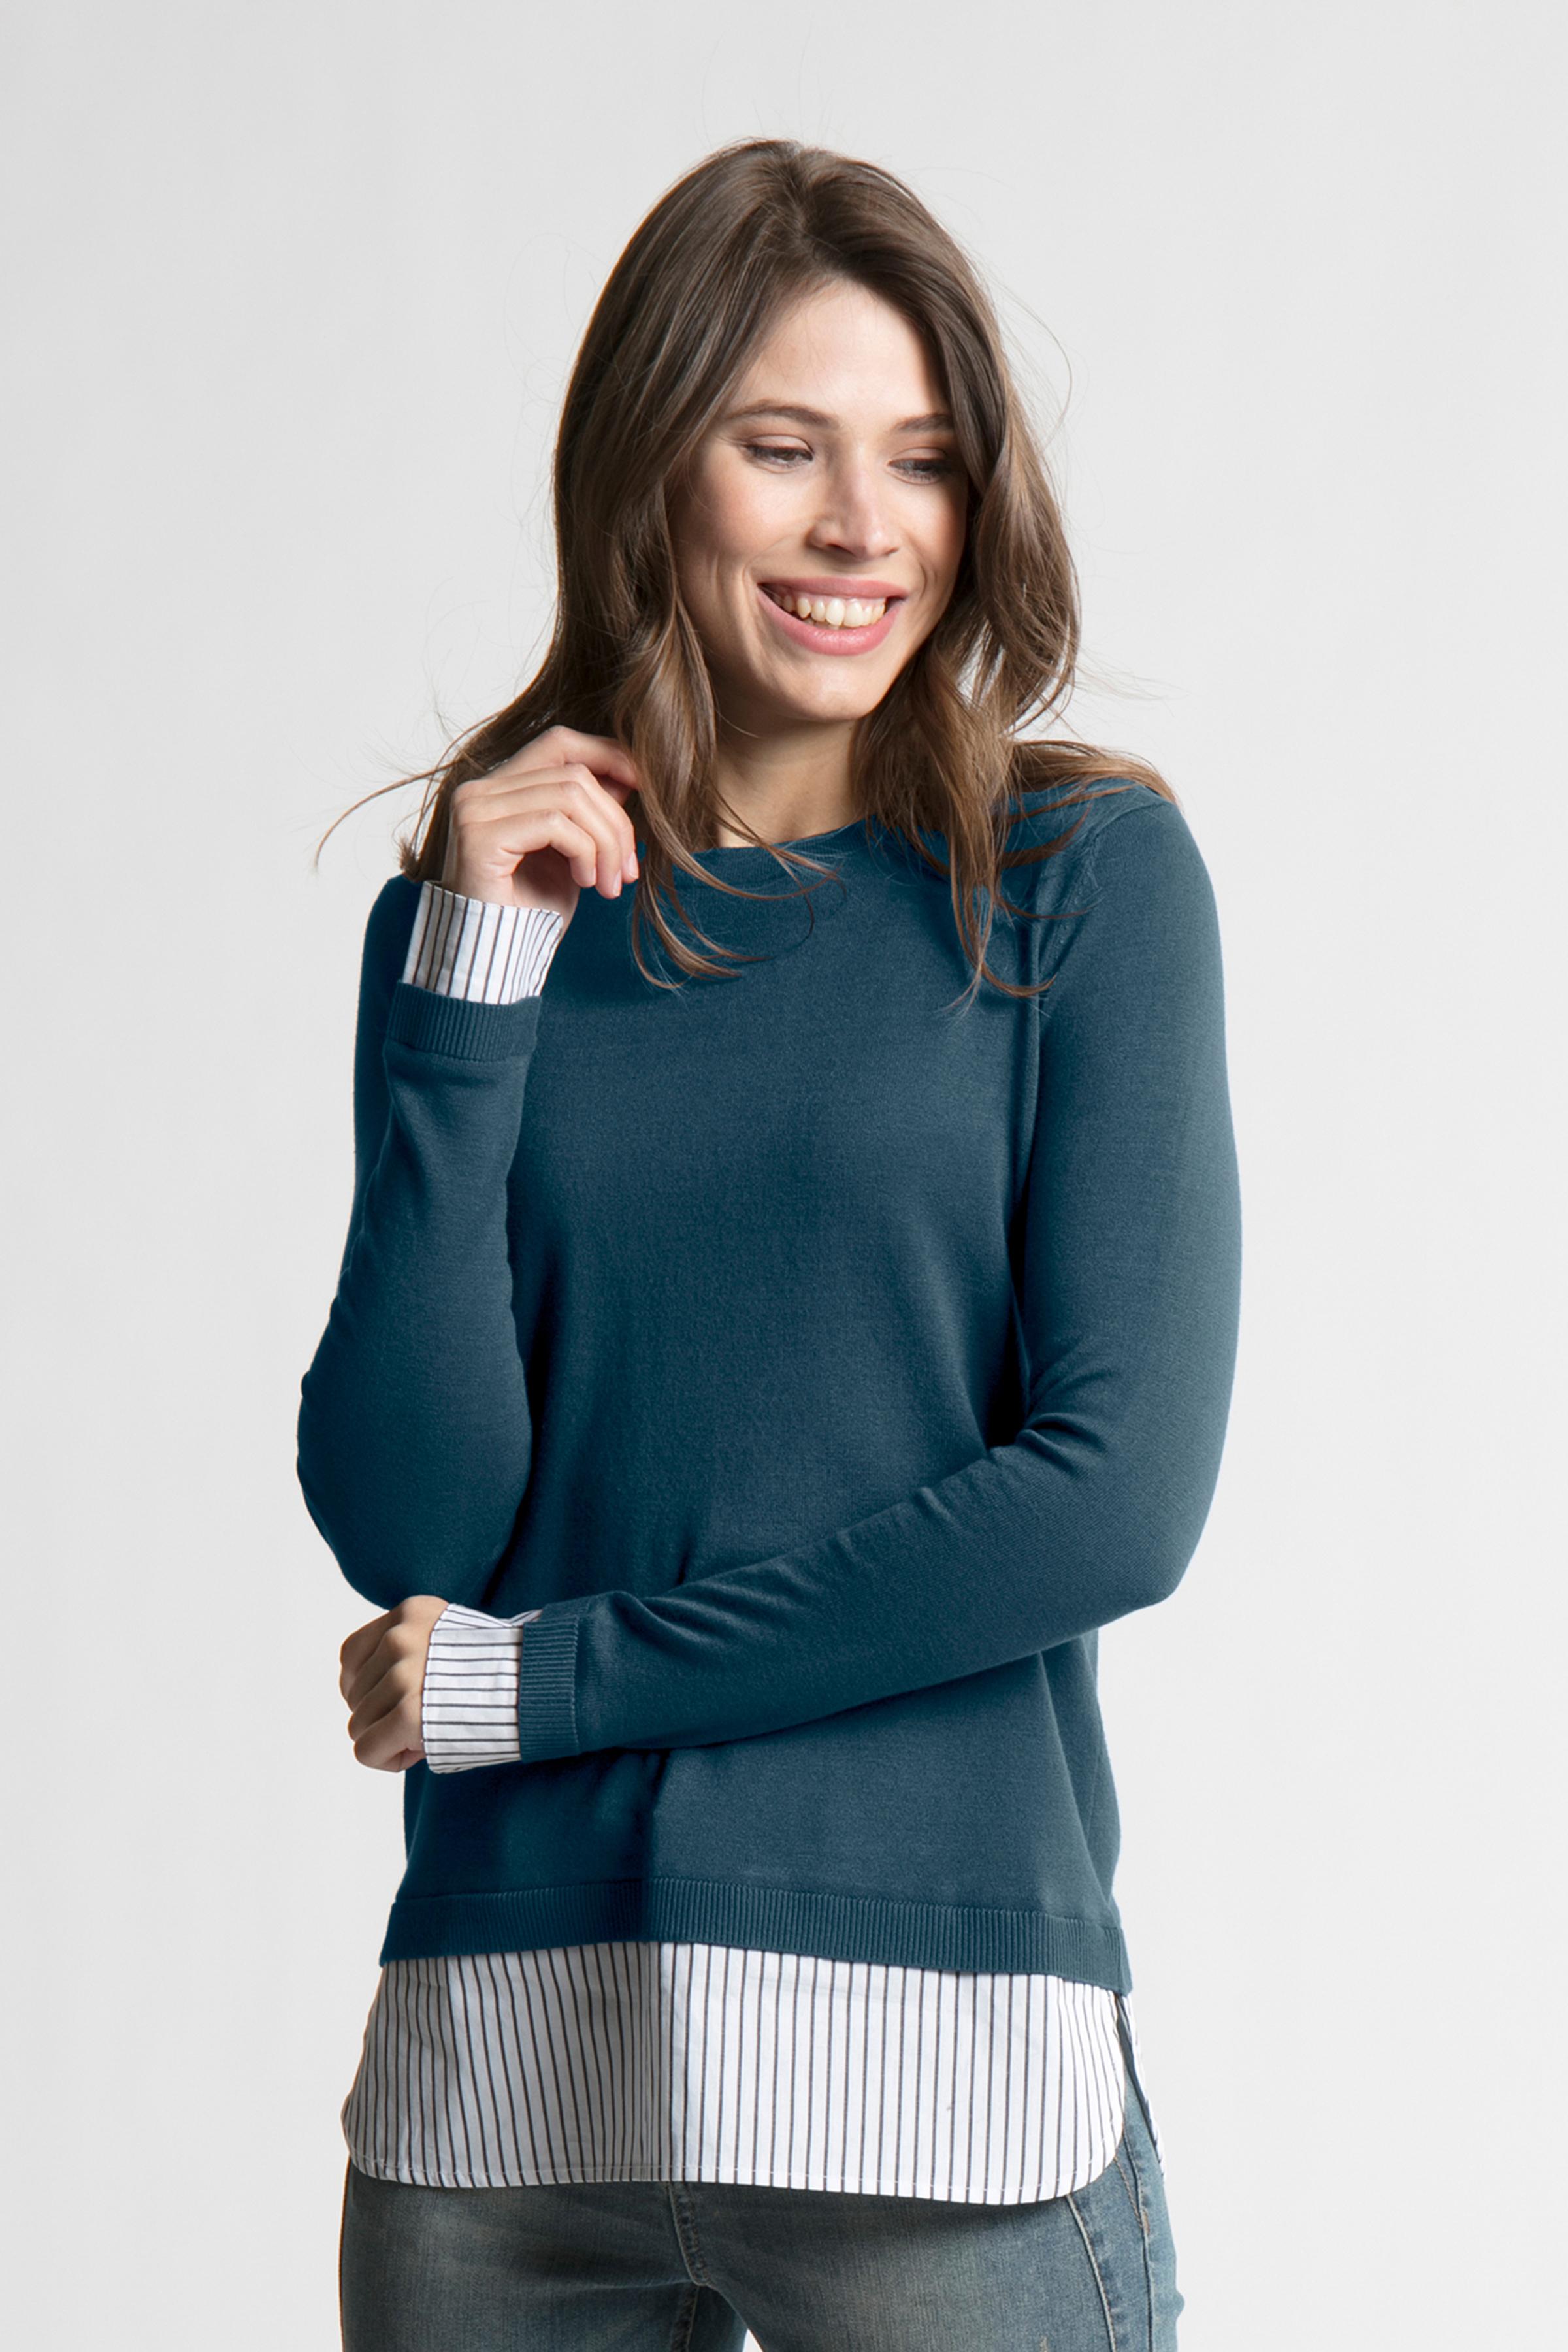 Dunkel marineblau Langarm-Bluse von Bon'A Parte – Shoppen Sie Dunkel marineblau Langarm-Bluse ab Gr. S-2XL hier